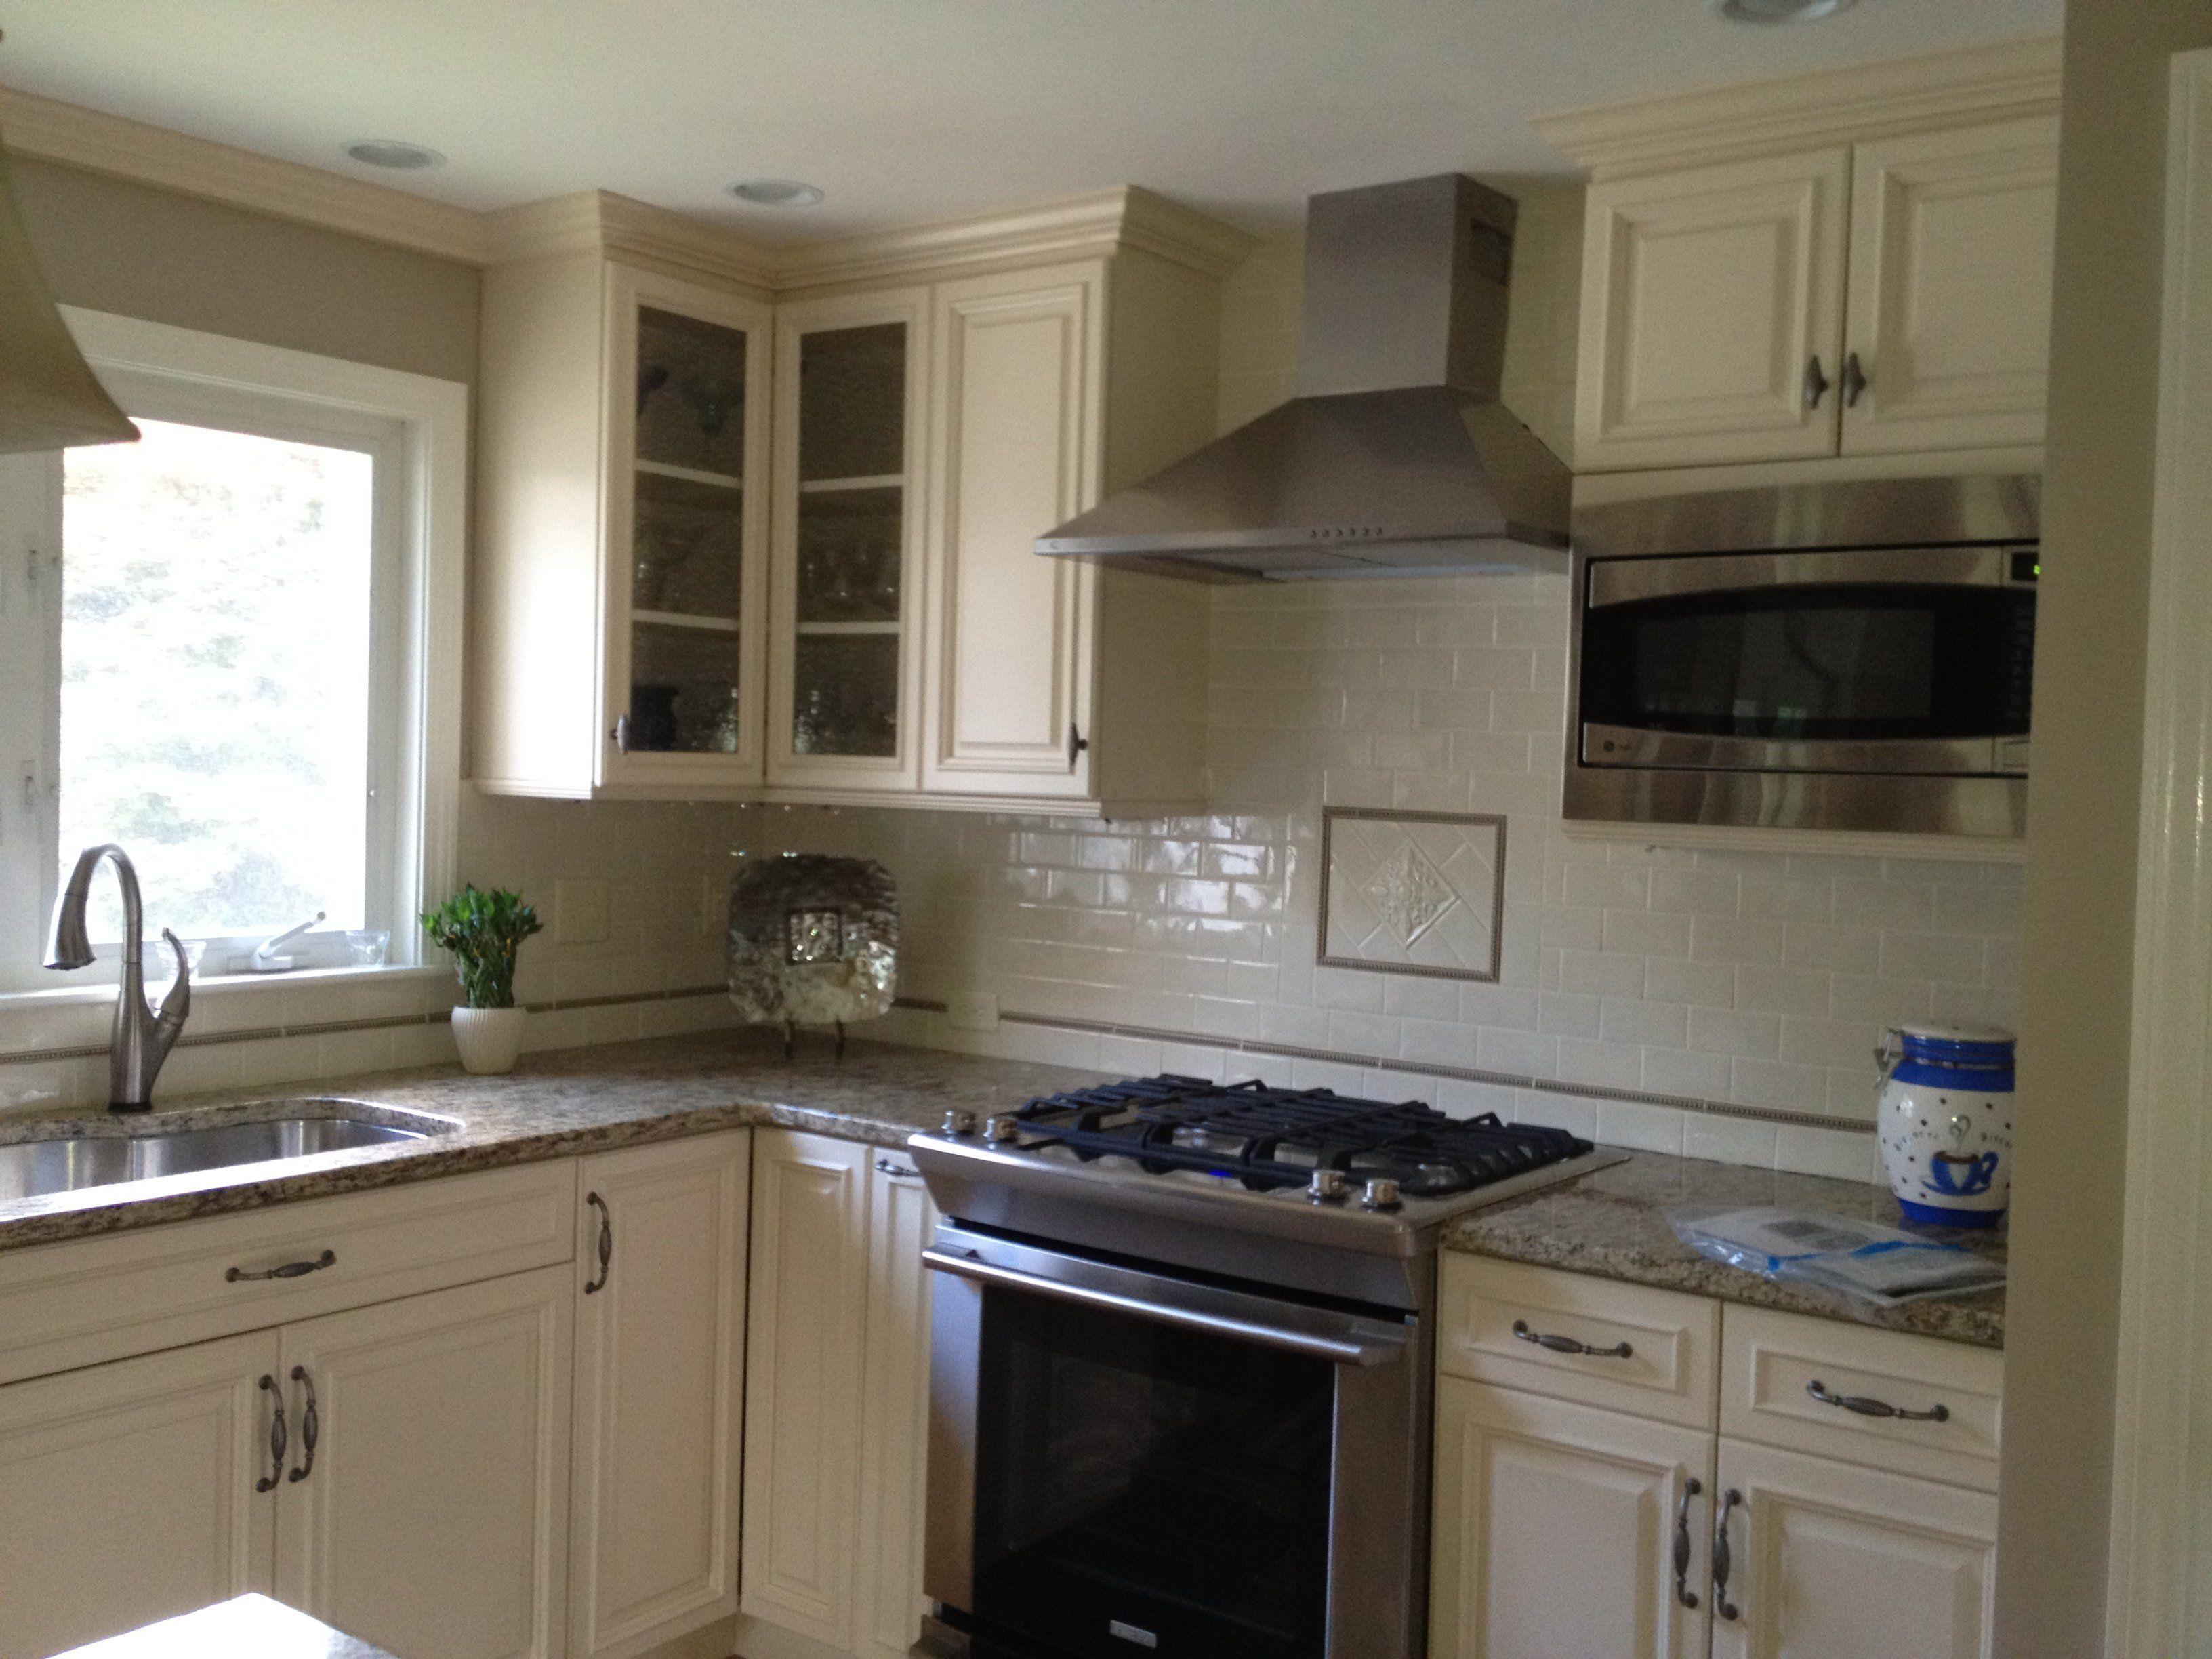 Interior Expressions Nardelli Home Decor Cabinets To Go Kitchen Inspirations Kitchen